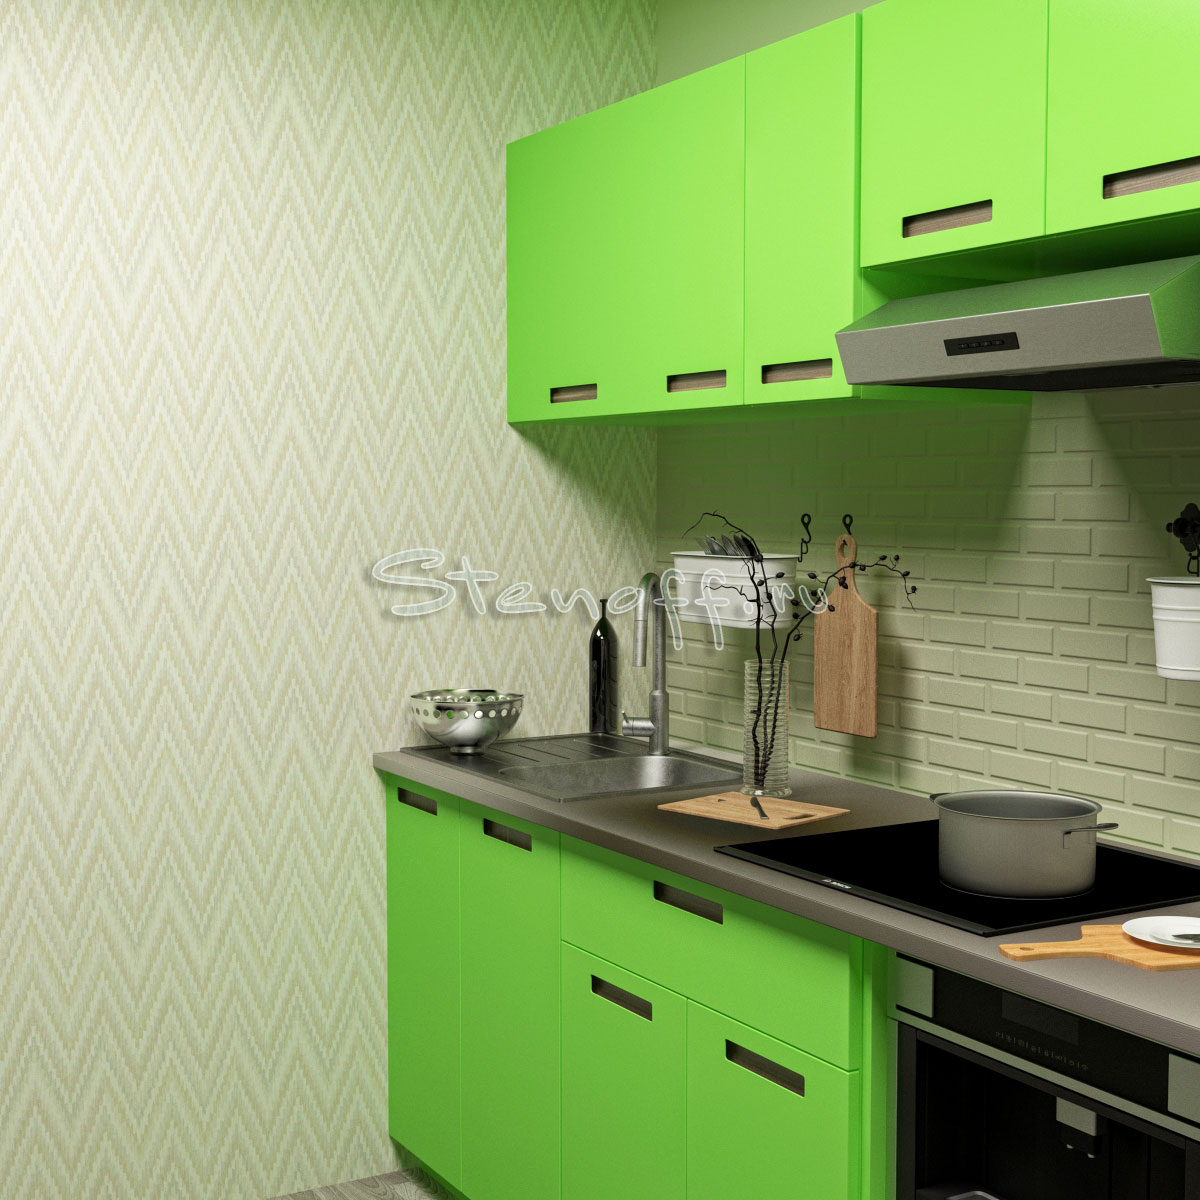 Зеленая кухня и обои с геометрическим рисунком><br></o:p></p>       <p style=